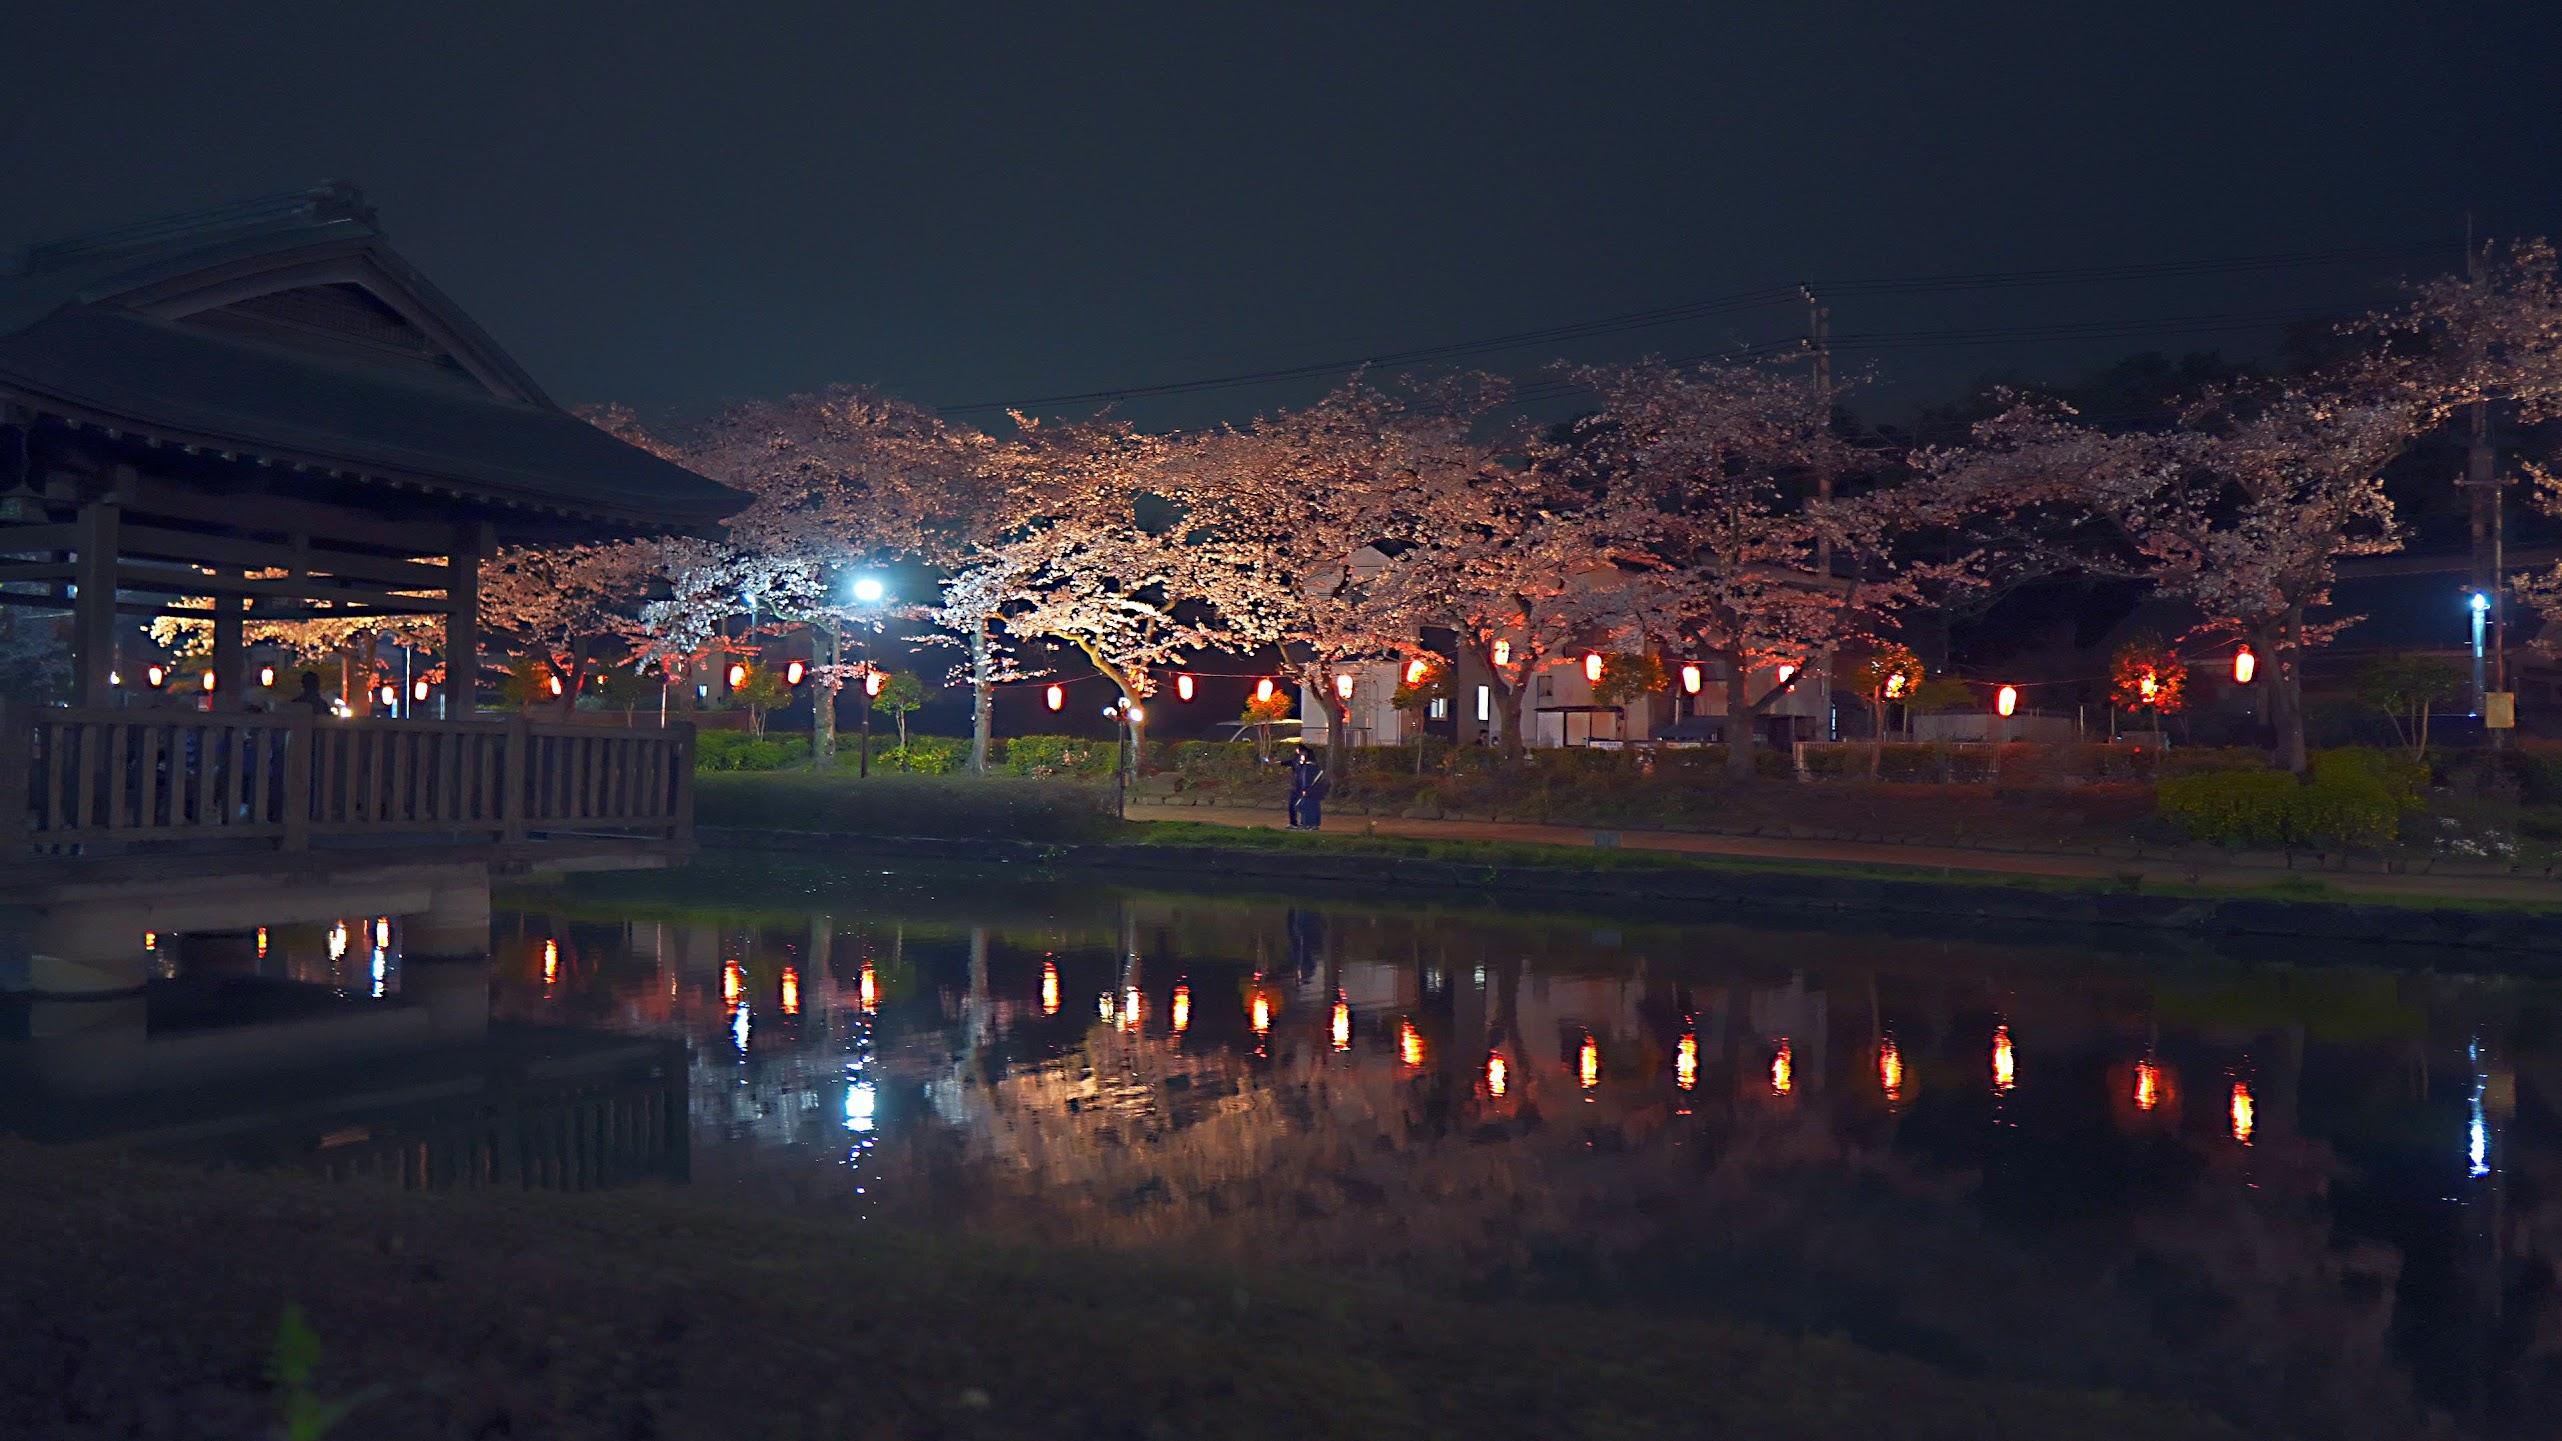 東松山上沼公園&下沼公園の桜(α6600+SIGMA 16mm F1.4+Crane M2)